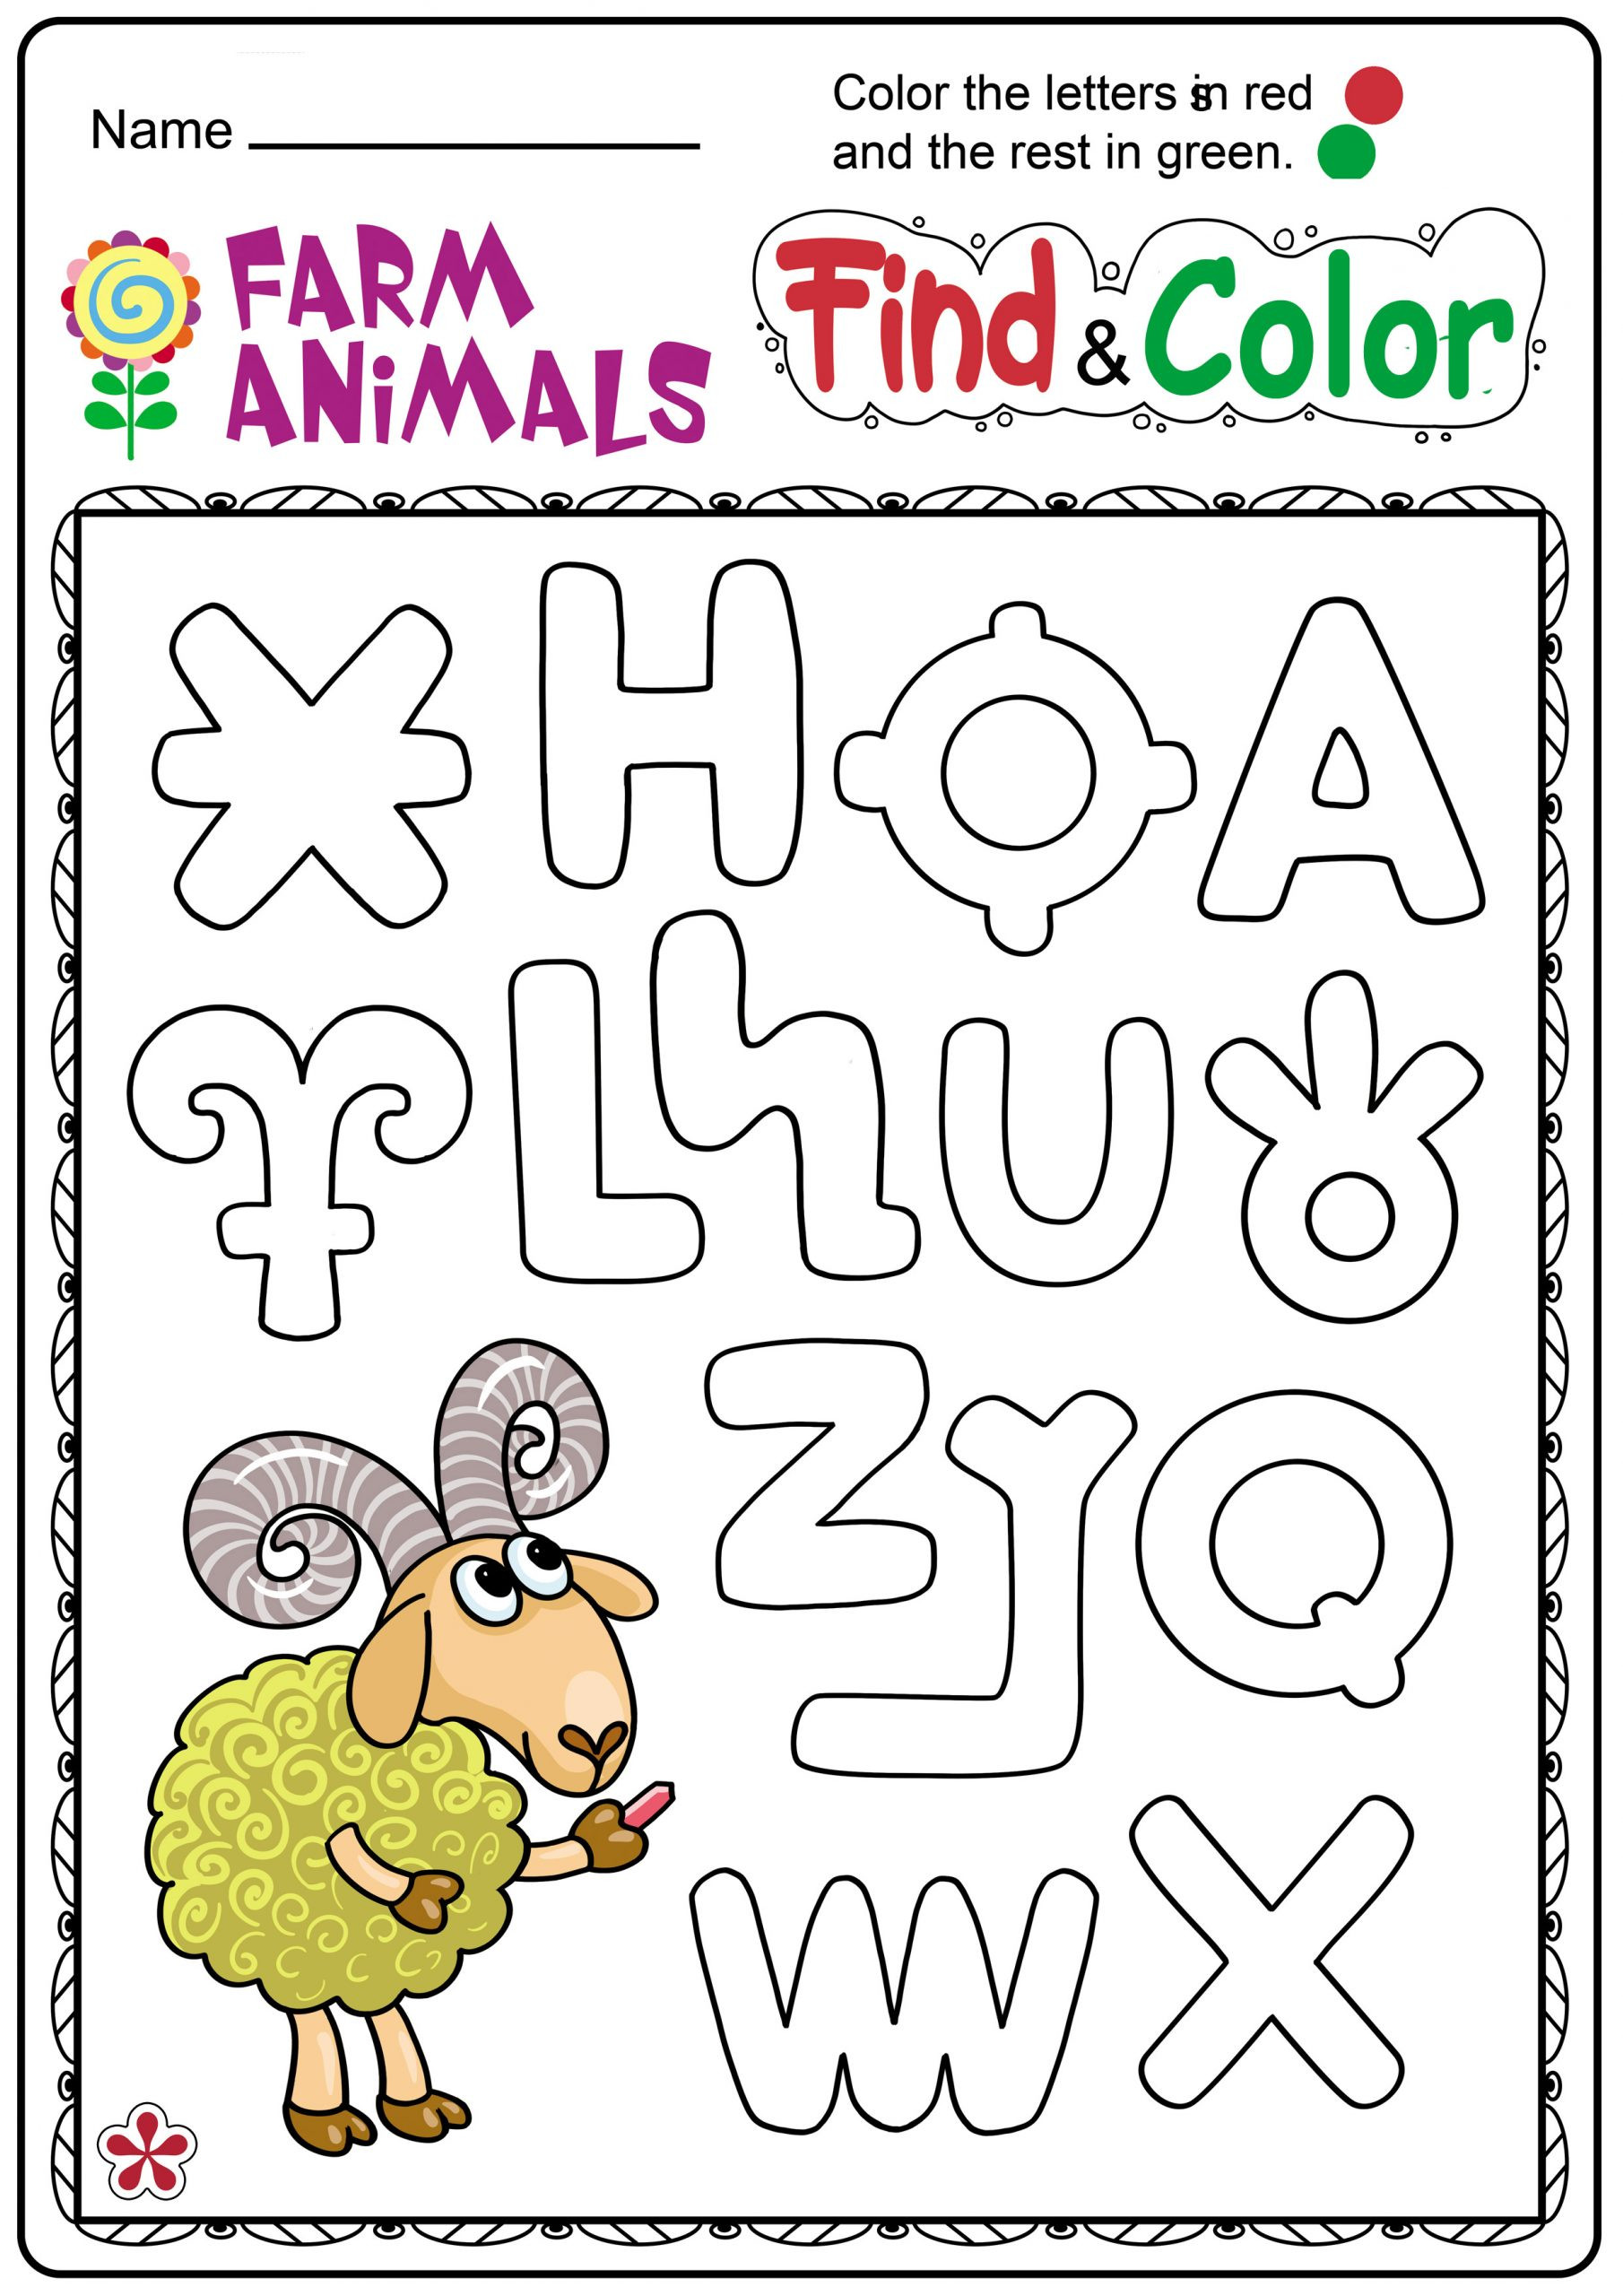 6 Domestic Animals Worksheets Free Printable